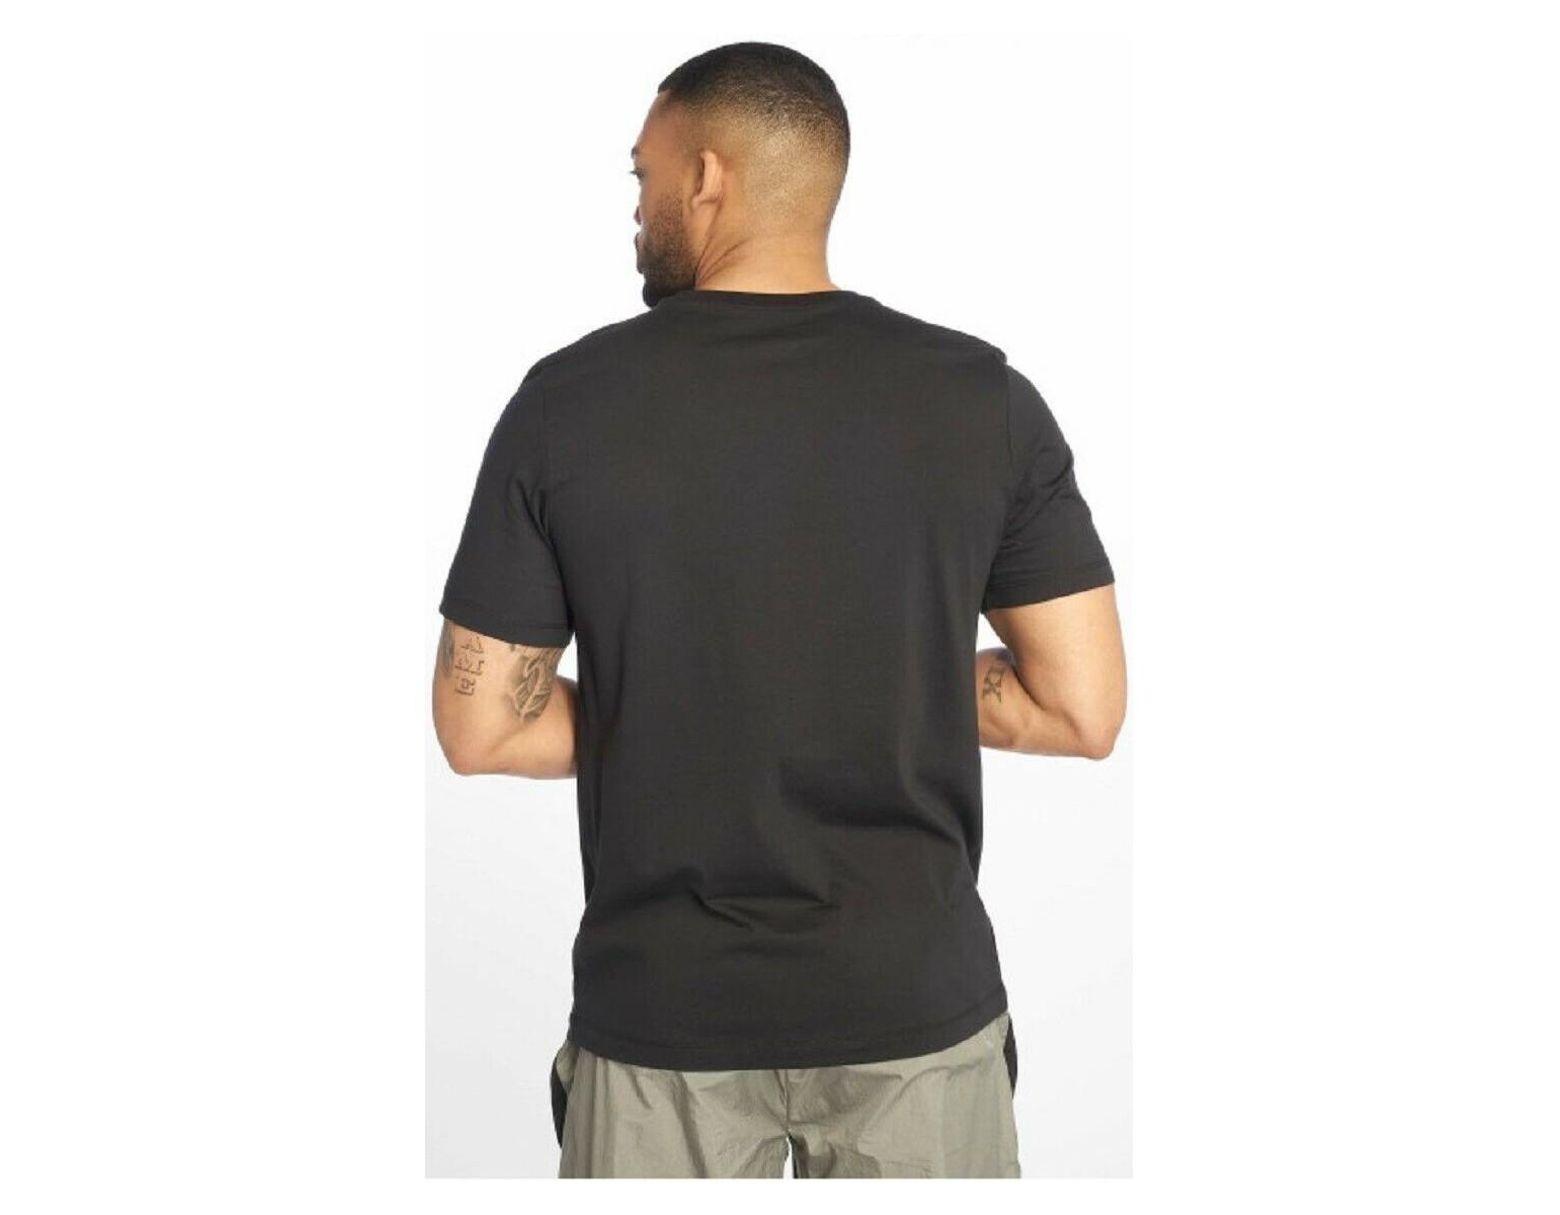 42aa25679ae4 Nike Jordan Jumpman Flight Men s T Shirt In Black in Black for Men - Lyst